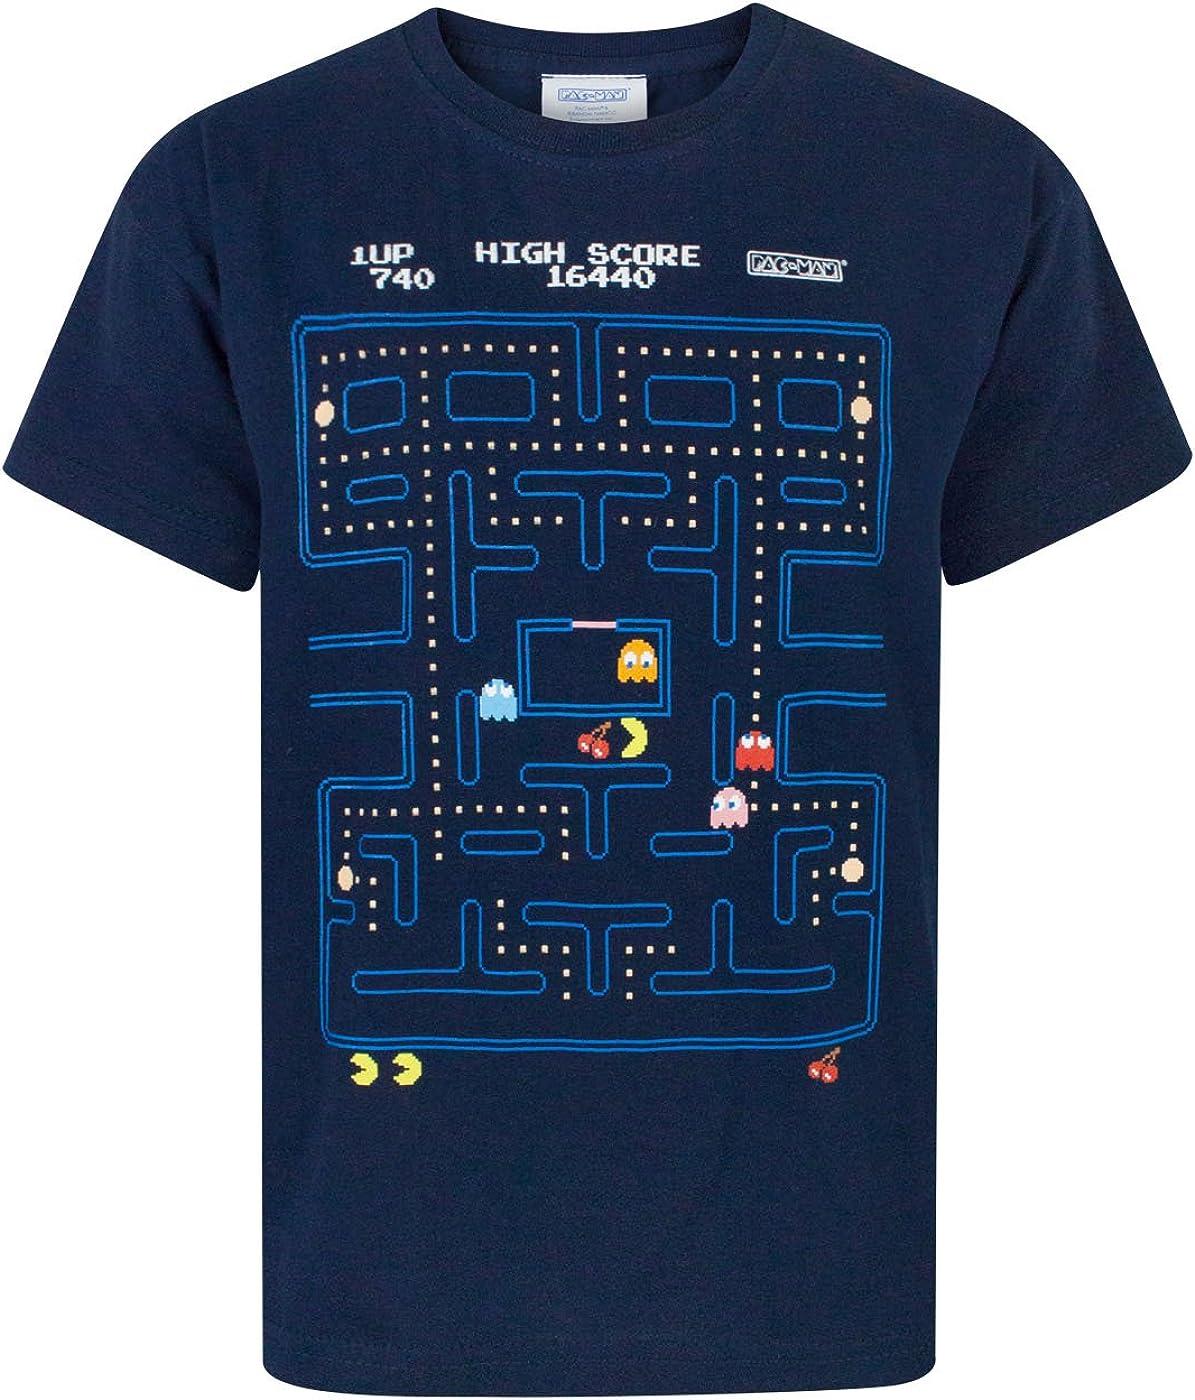 Pacman Classic Action Scene Boys T-Shirt